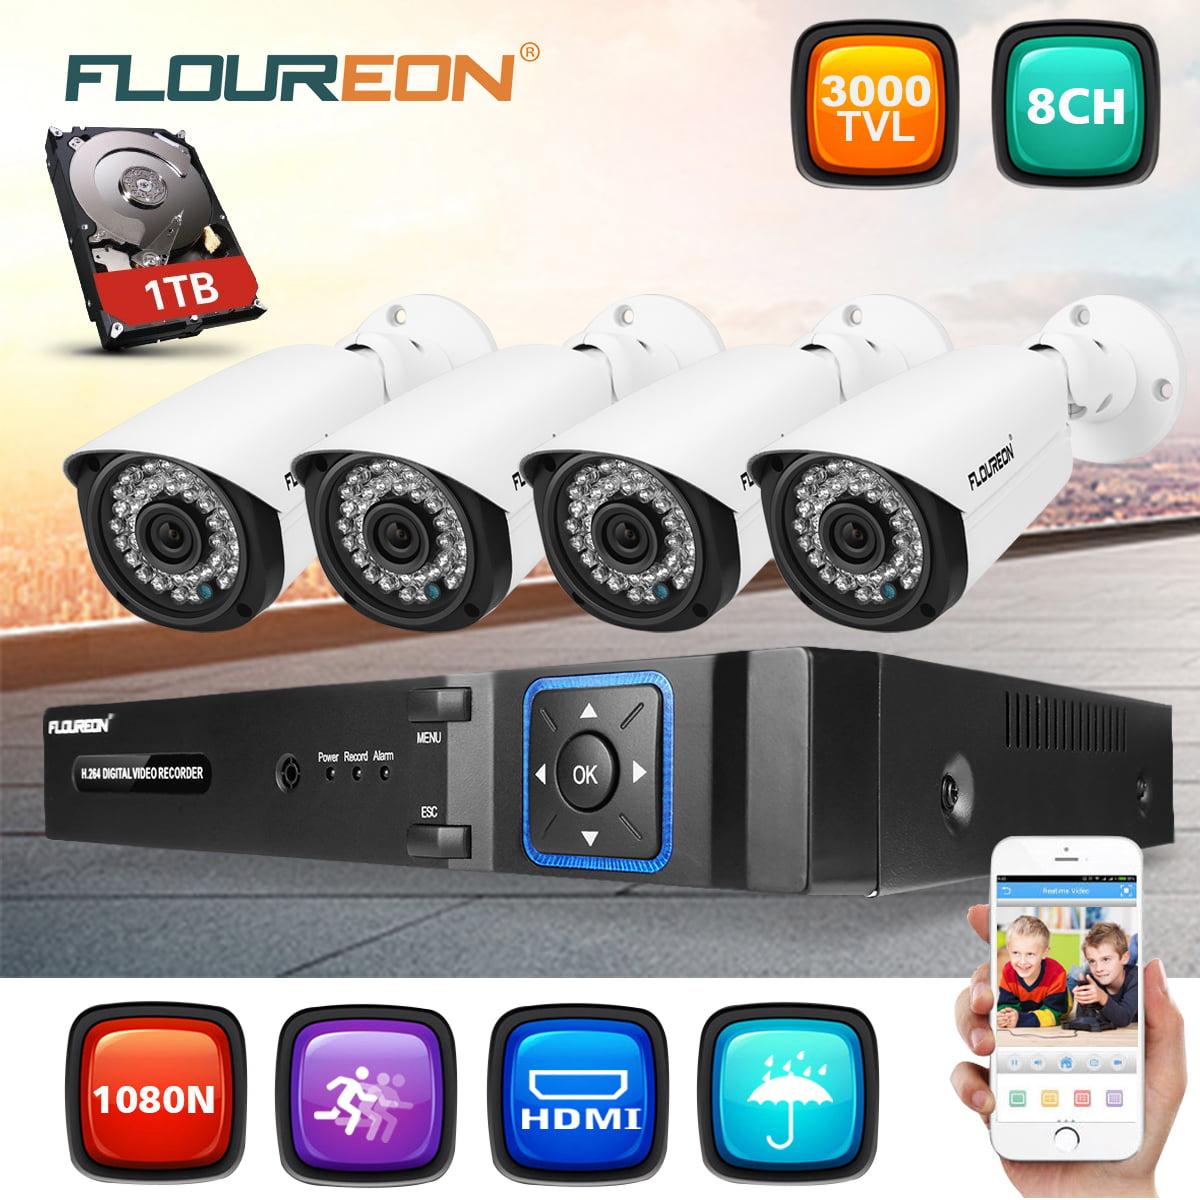 8CH DVR Überwachungskamera System 5IN1 1080N Video DVR Recorder 4X 1080P Kameras